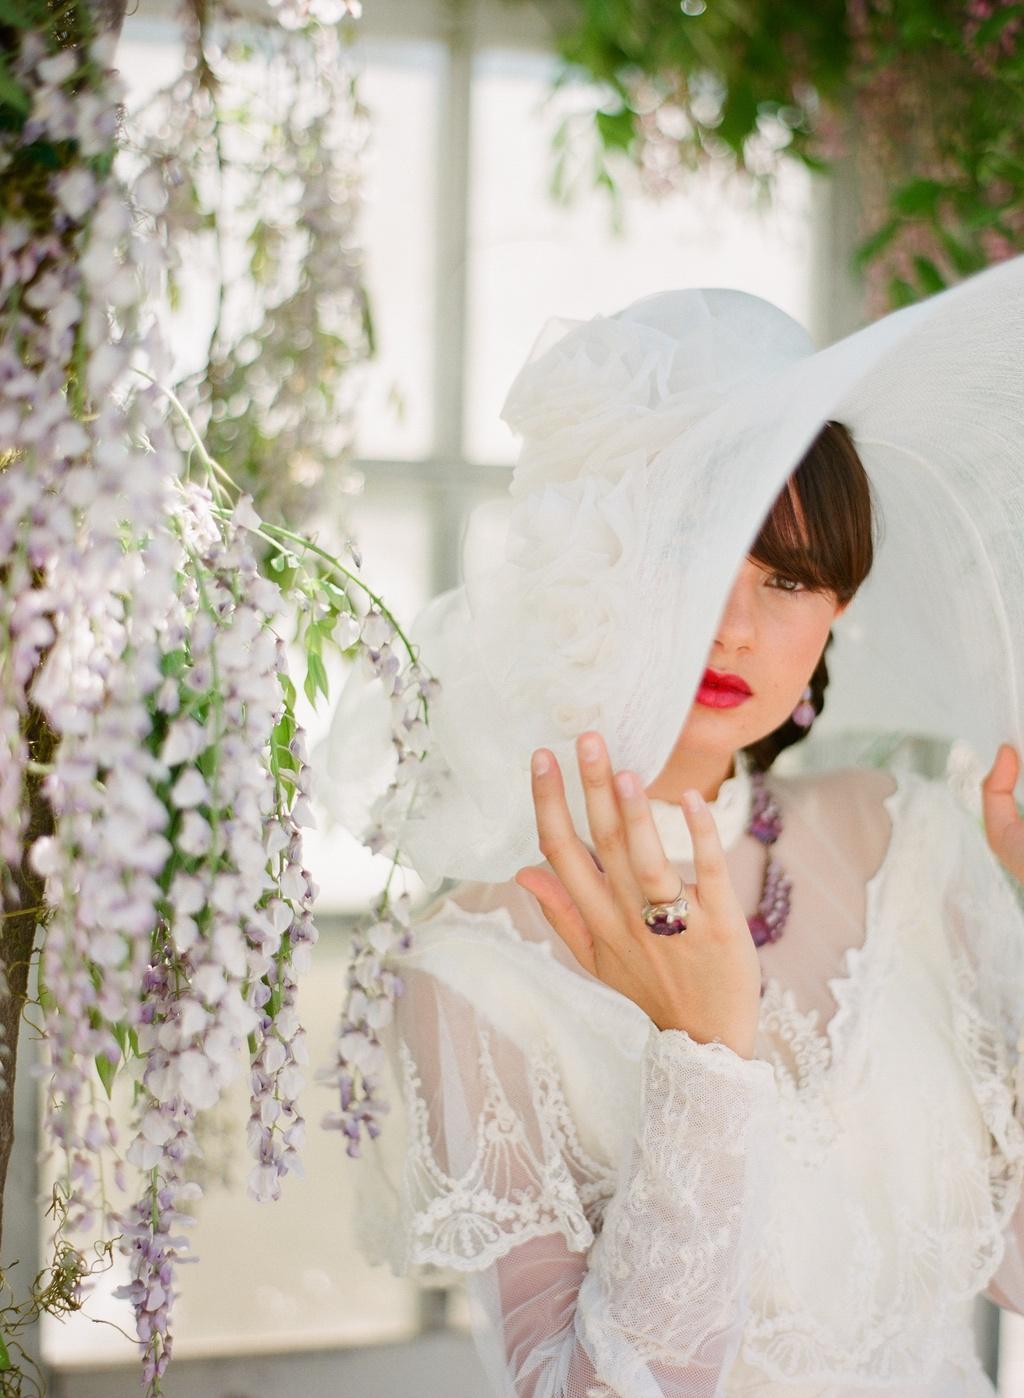 Styled-wedding-beaux-arts-tea-time-monique-lhuillier-santa-barbara-chic-bride-hat-1.full